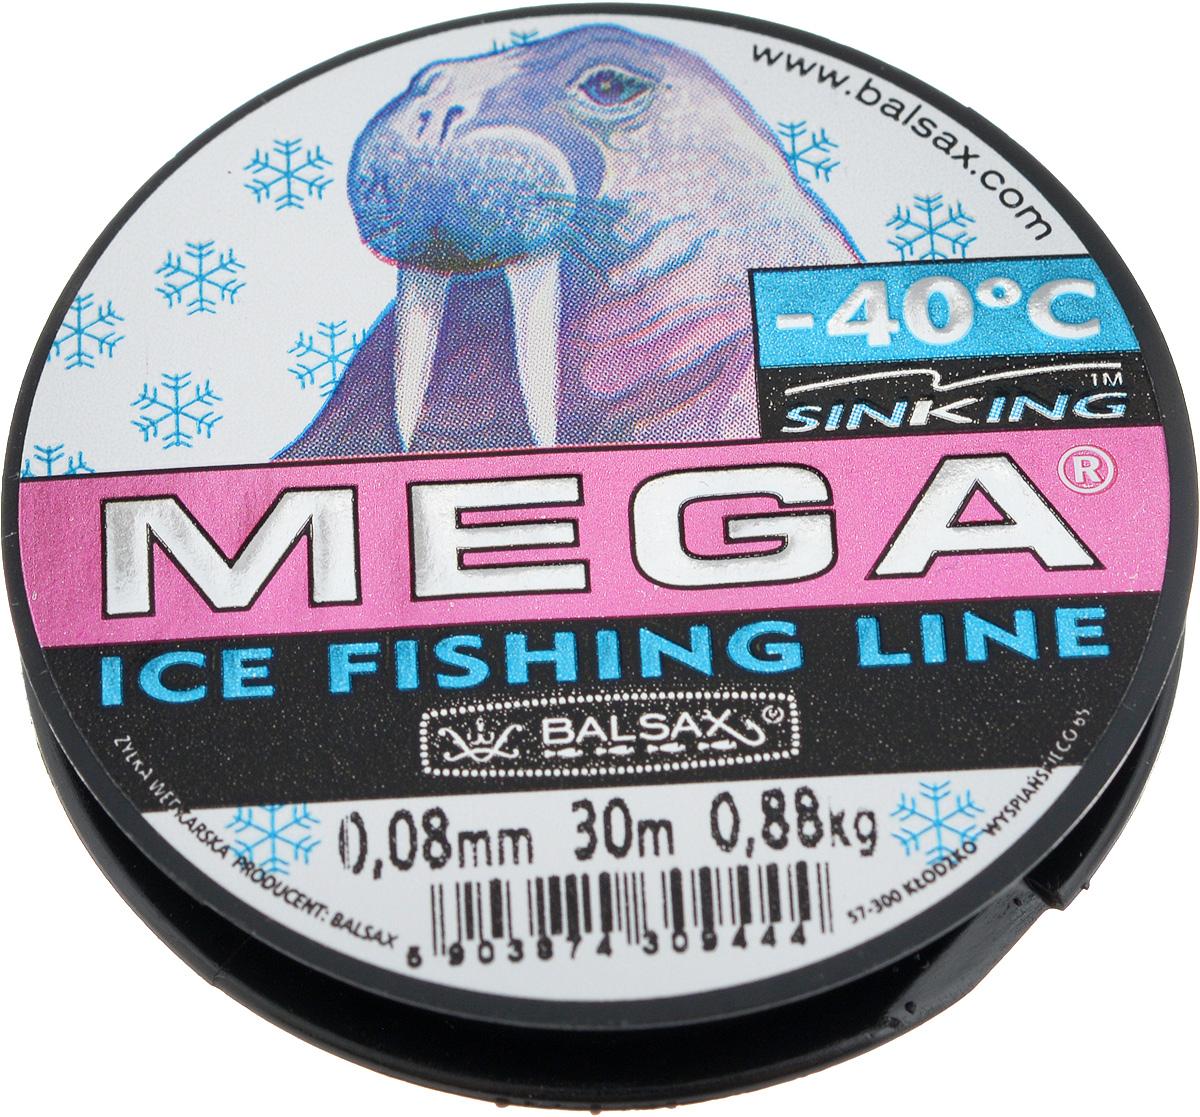 Леска зимняя Balsax Mega, 30 м, 0,08 мм, 0,88 кг леска balsax mega winter